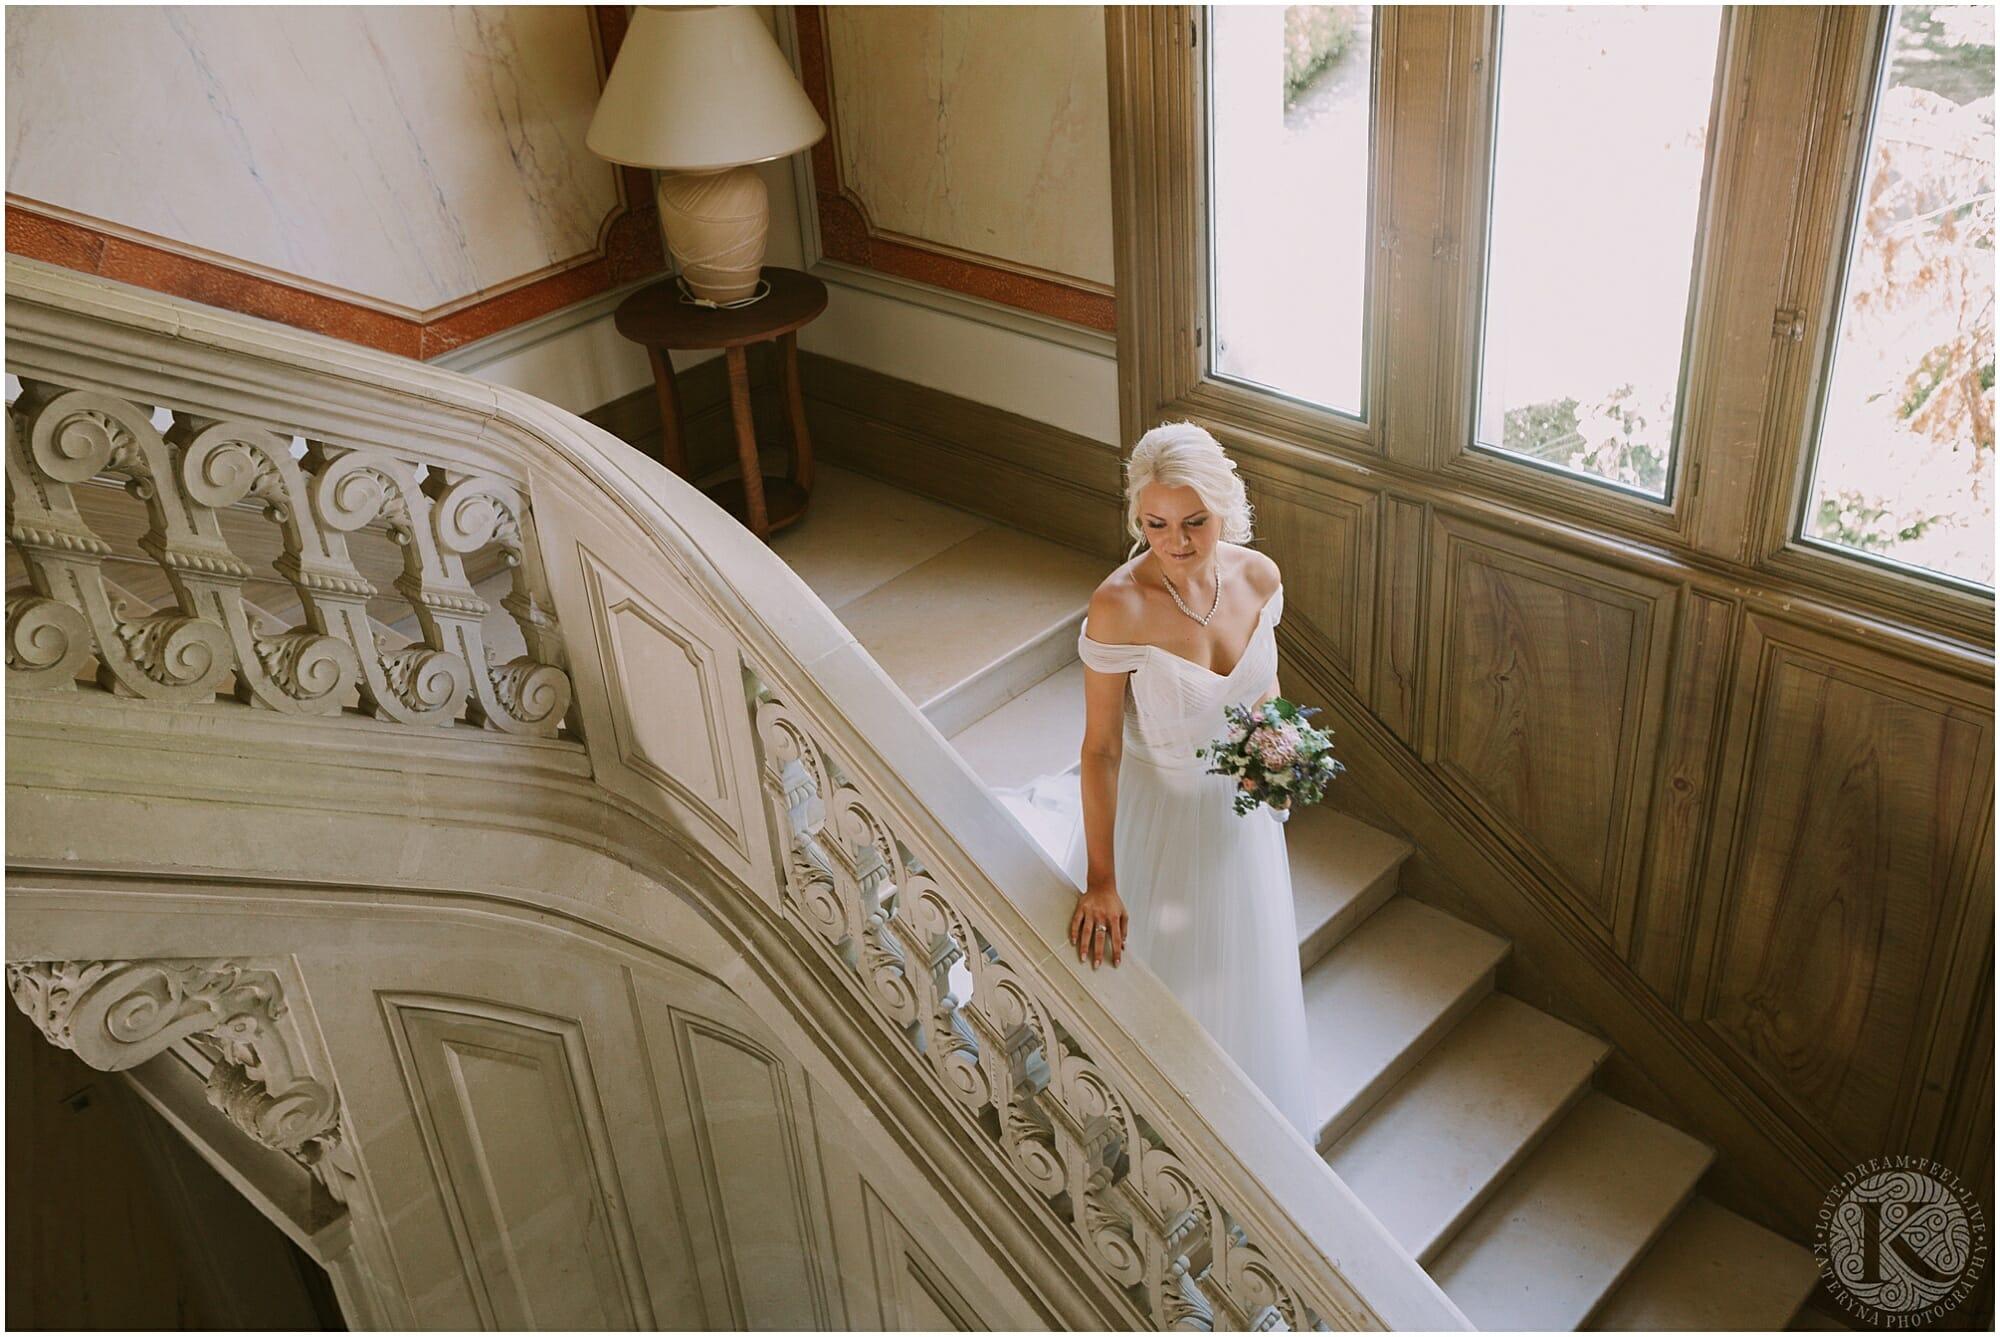 Kateryna-photos-photographe-mariage-chateau-des-3-fontaines-provence-avignon-vaucluse-sud_0033.jpg